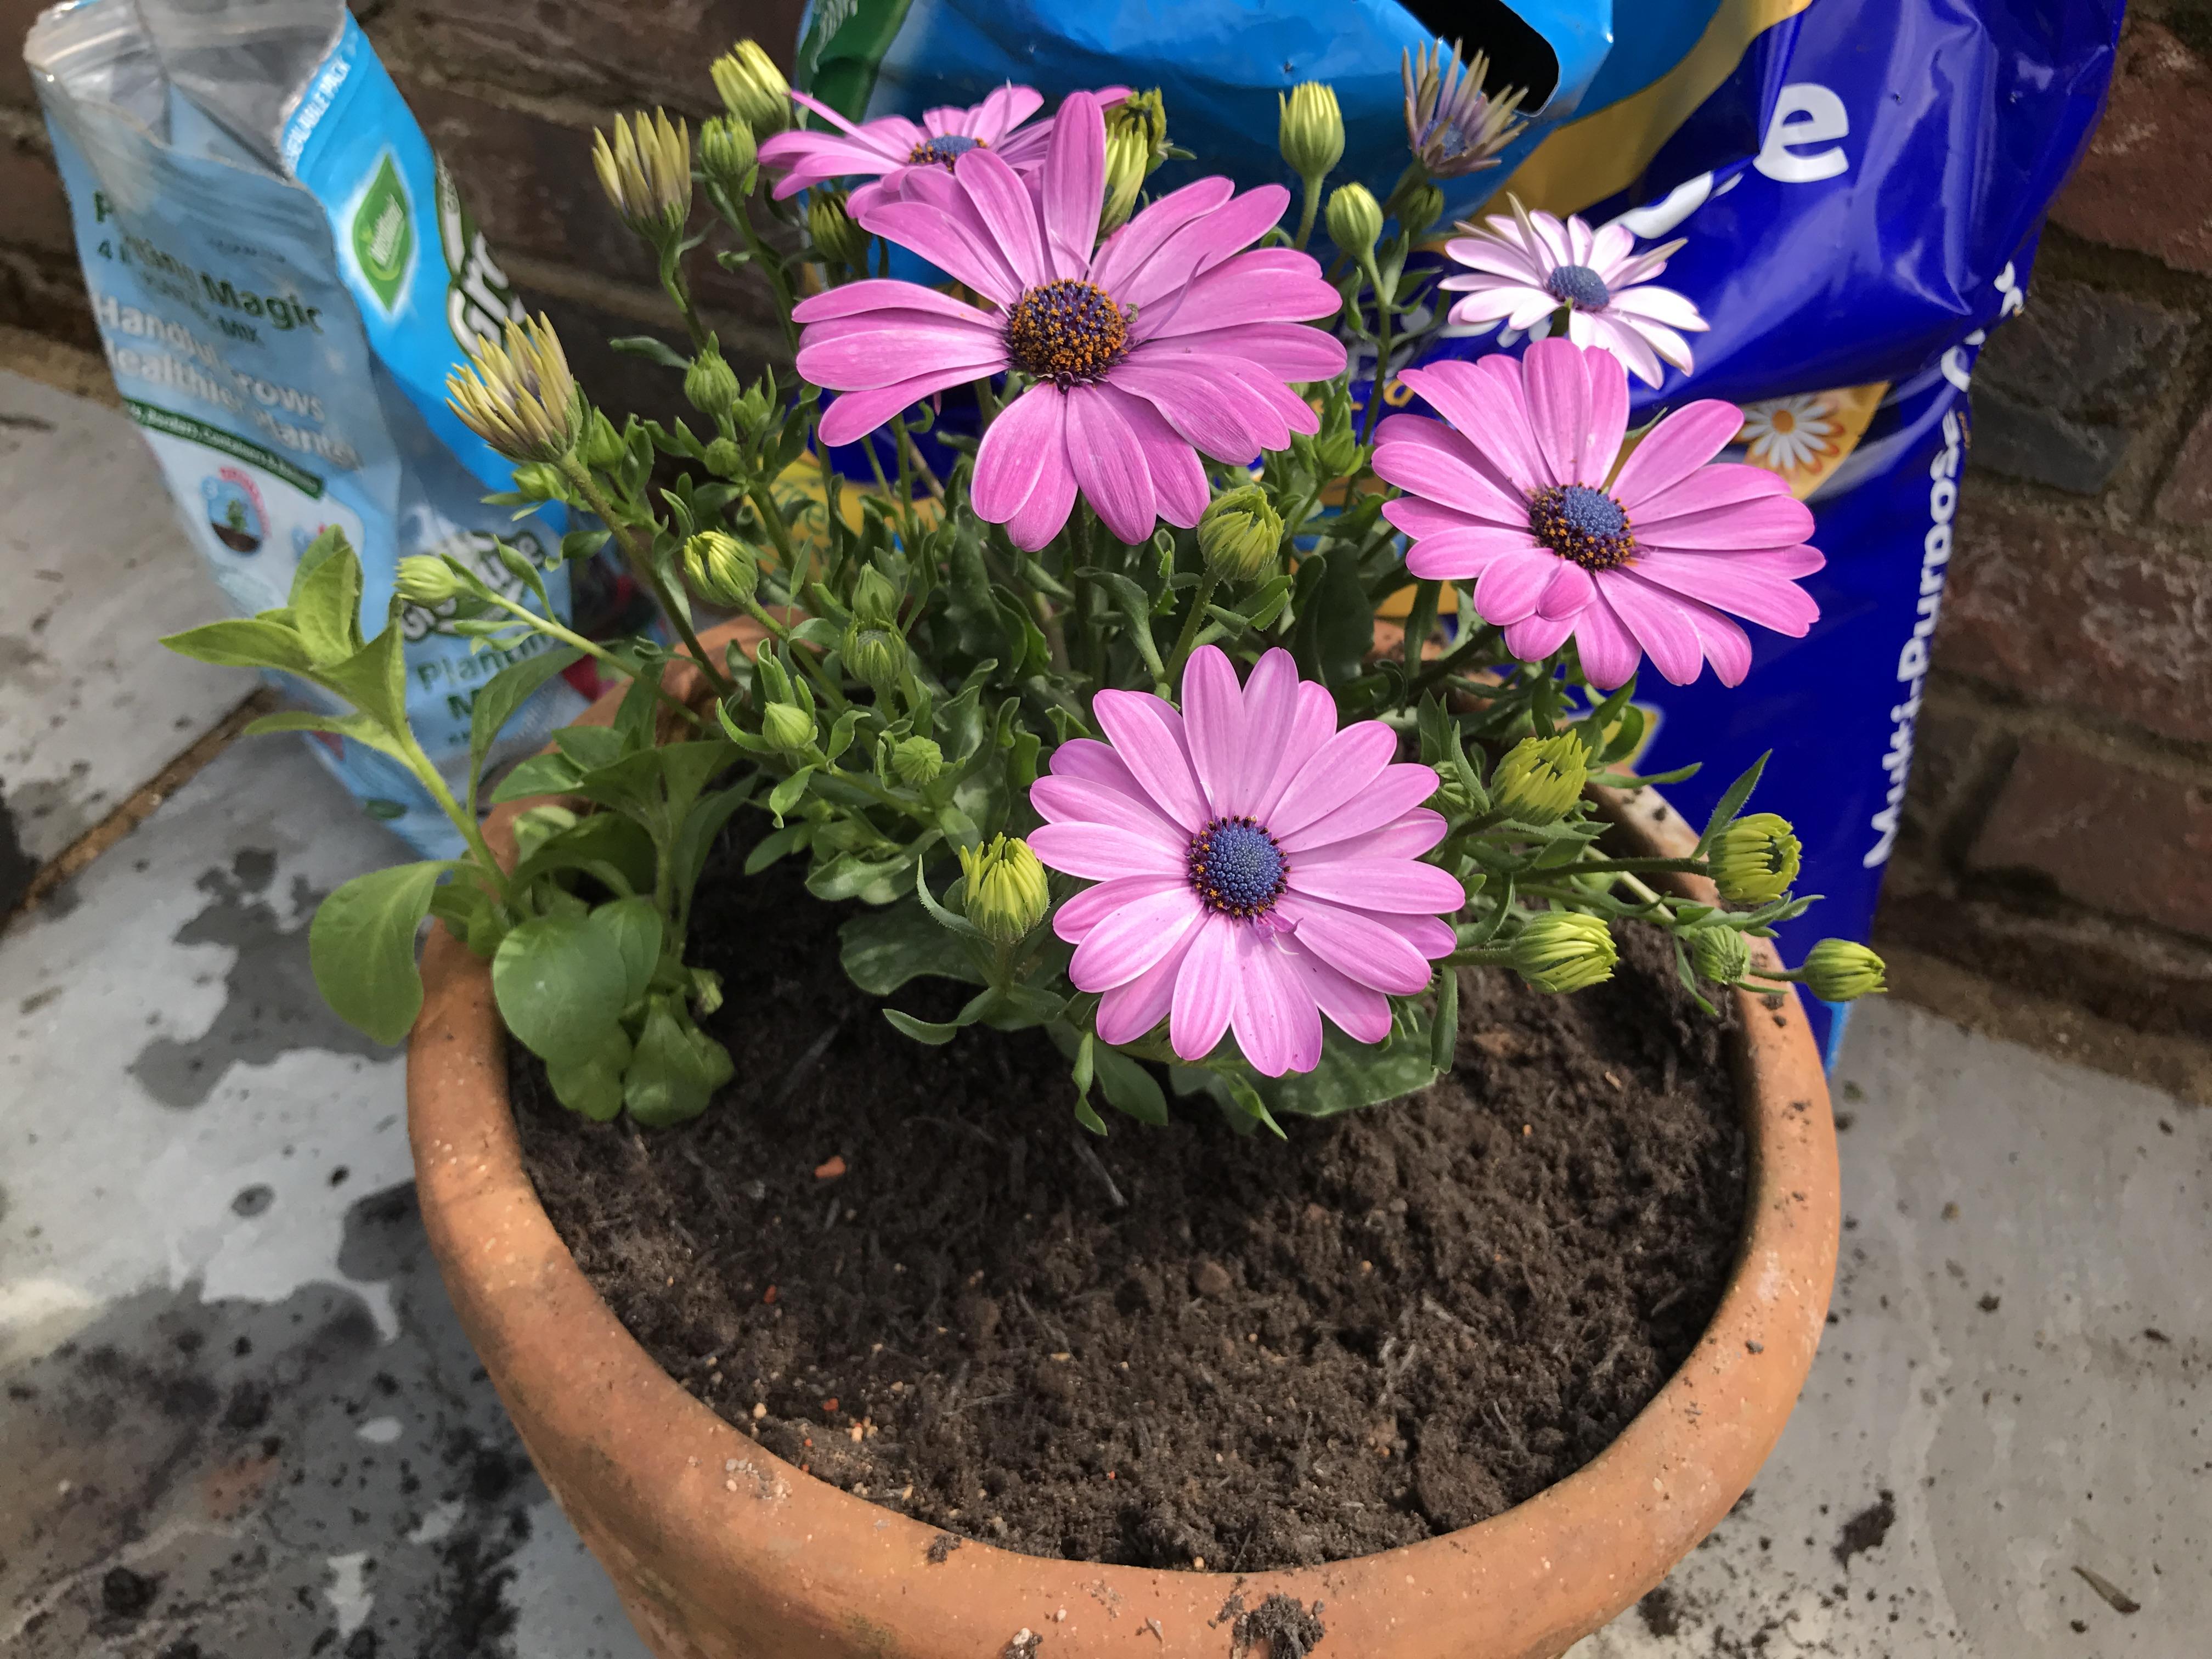 Start with the big plants (Hannah Stephenson/PA)